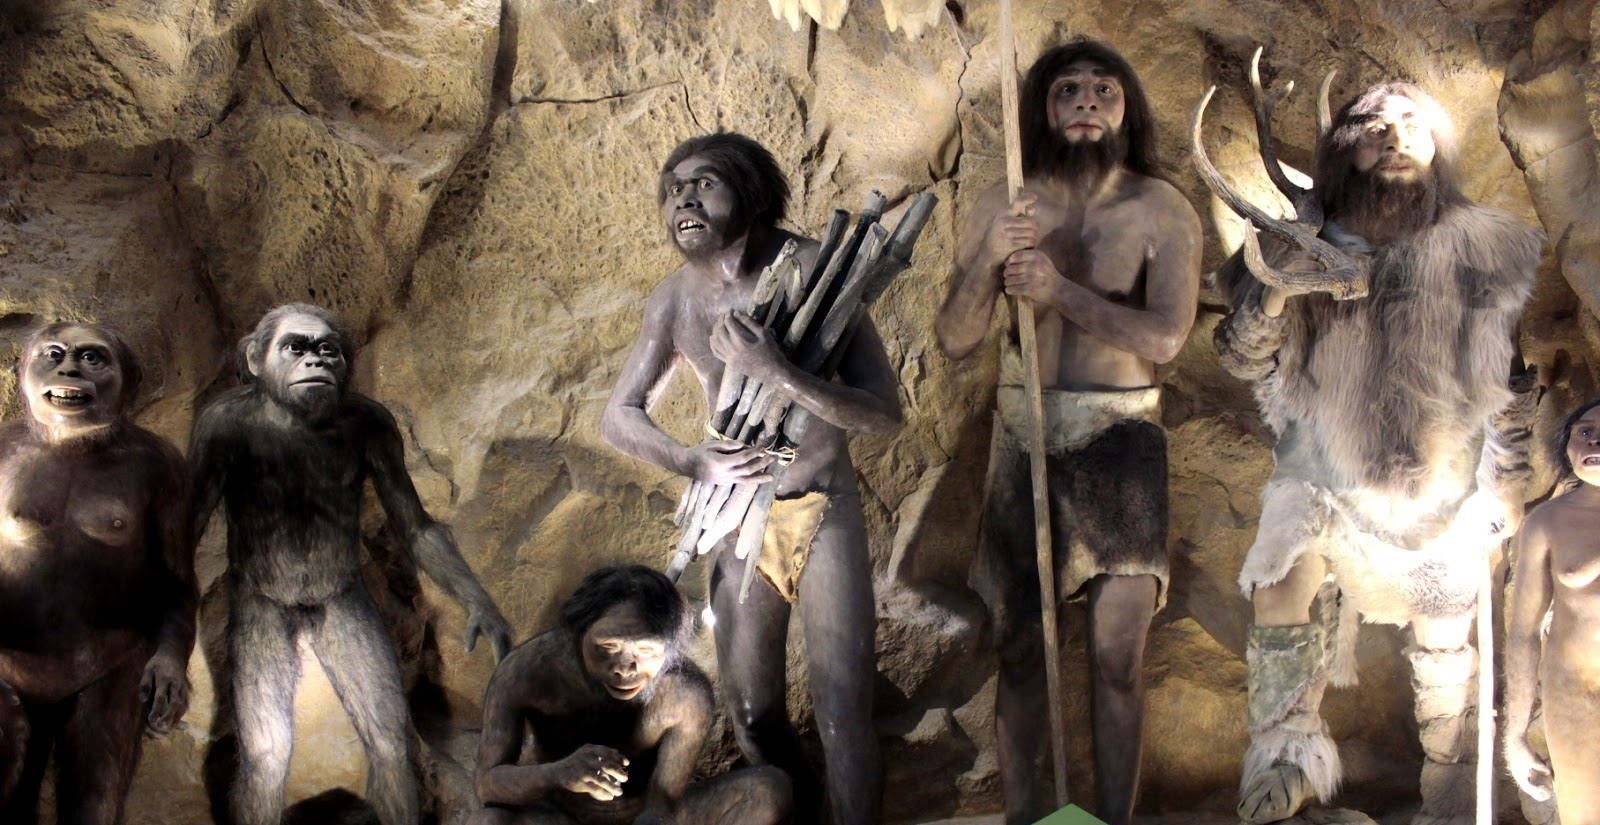 New Findings Show More Contact Between Prehistoric Humans